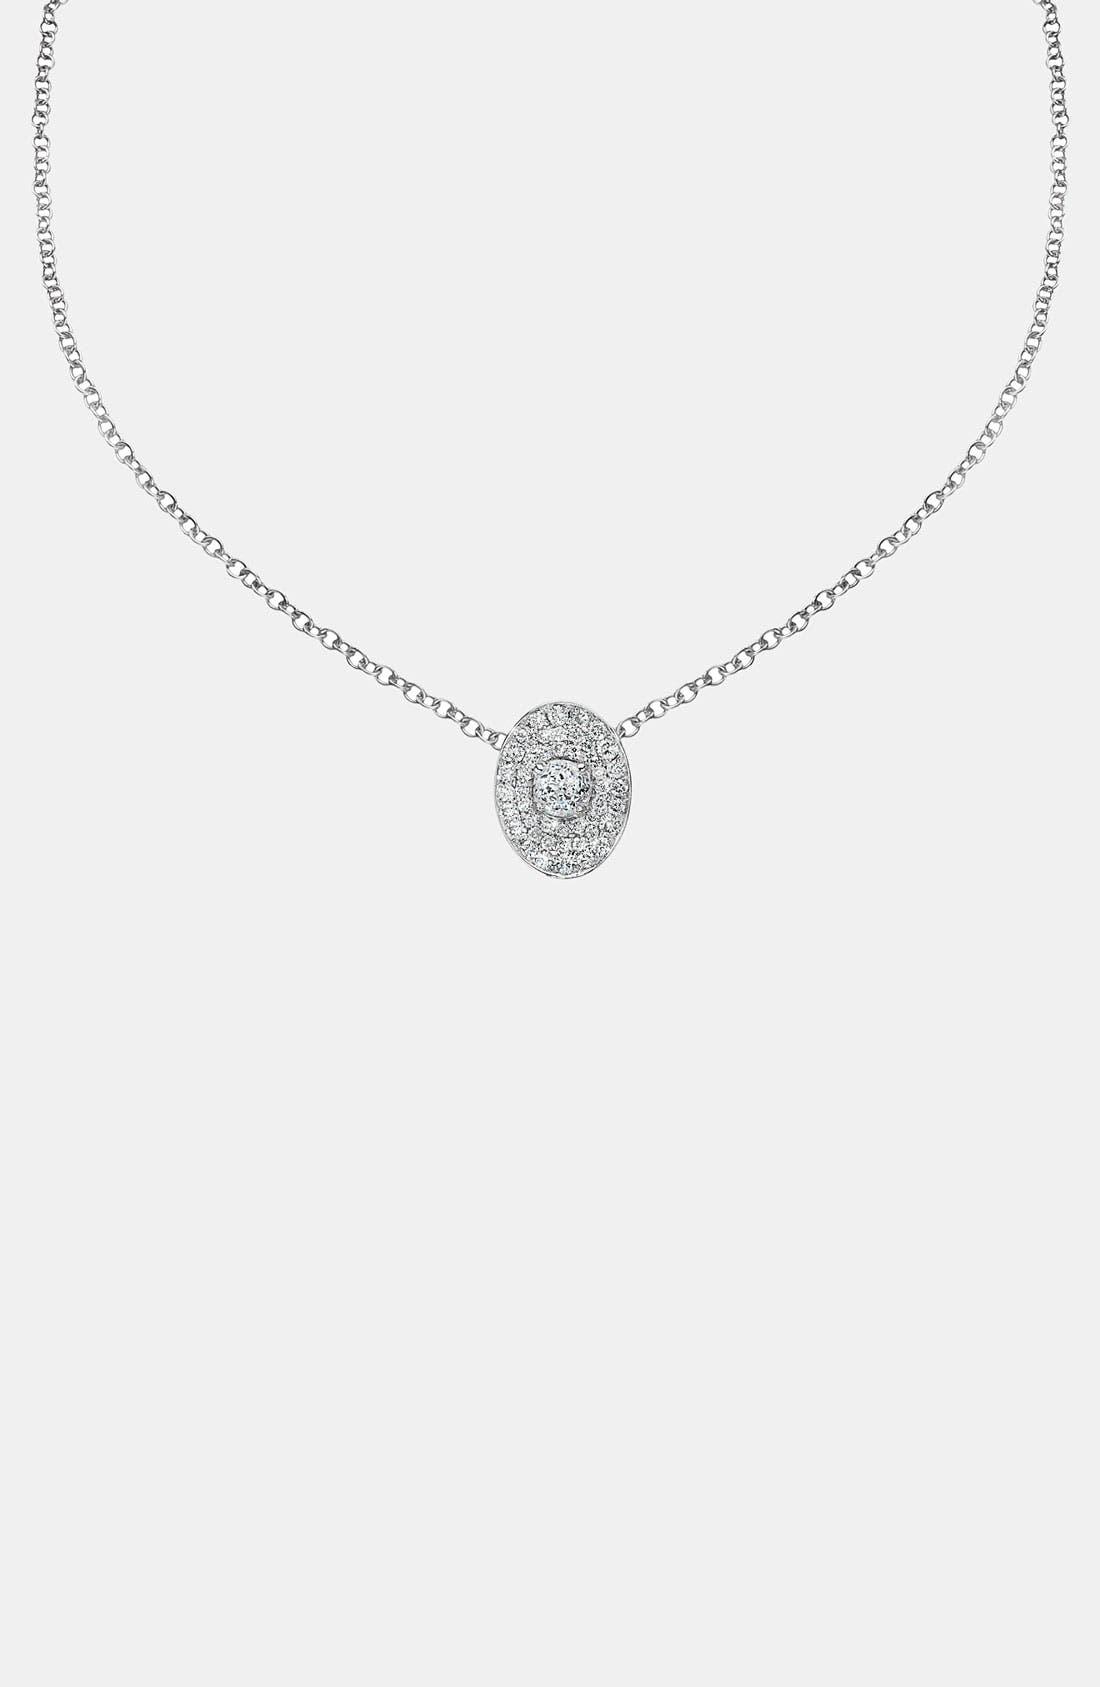 Alternate Image 1 Selected - Ivanka Trump 'Signature' Oval Pavé Diamond Pendant Necklace